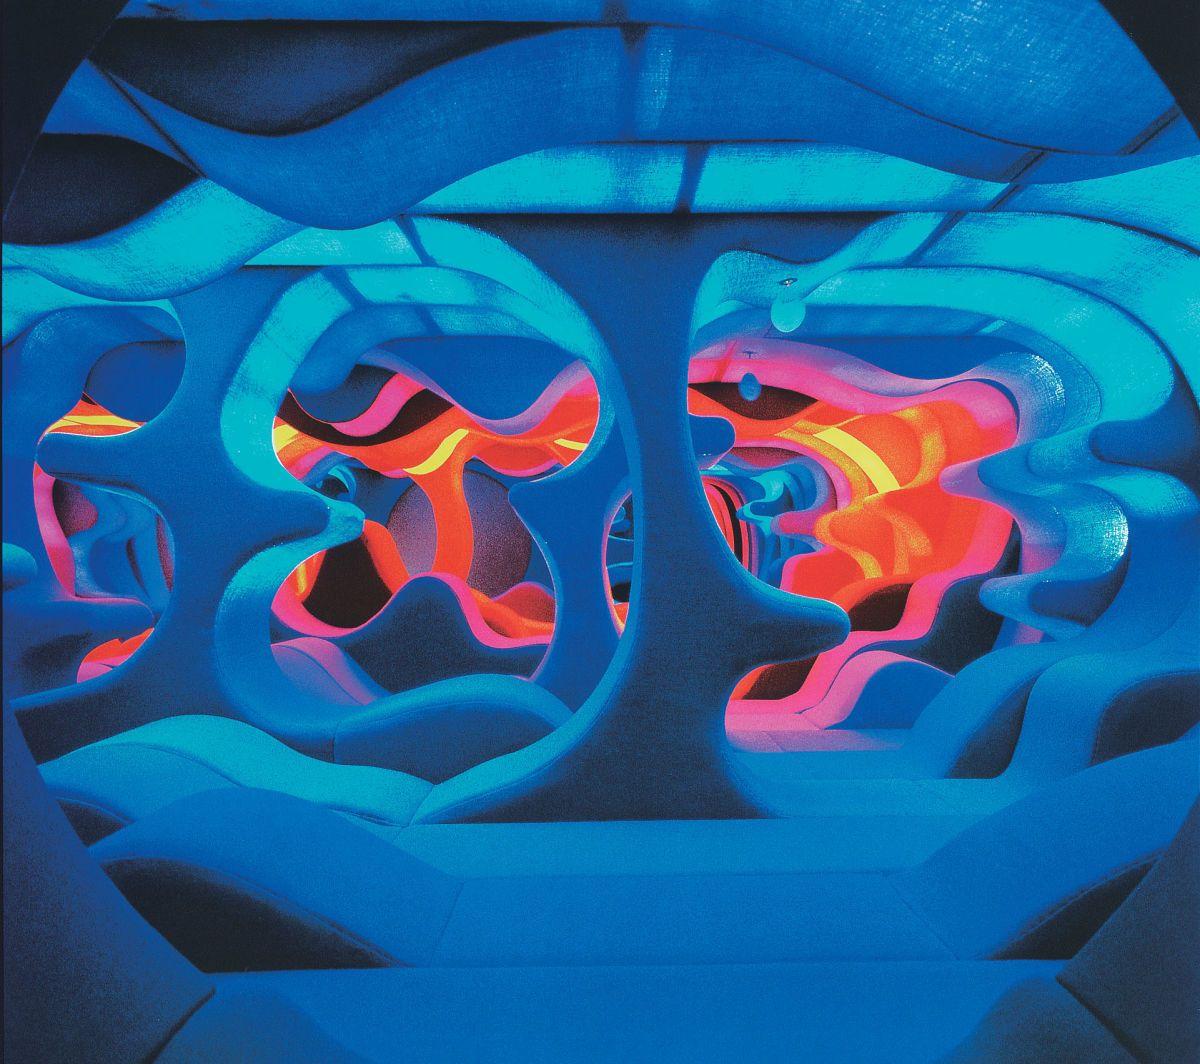 Verner panton interior design -  Architecture In Germany Exhibition By Verner Panton